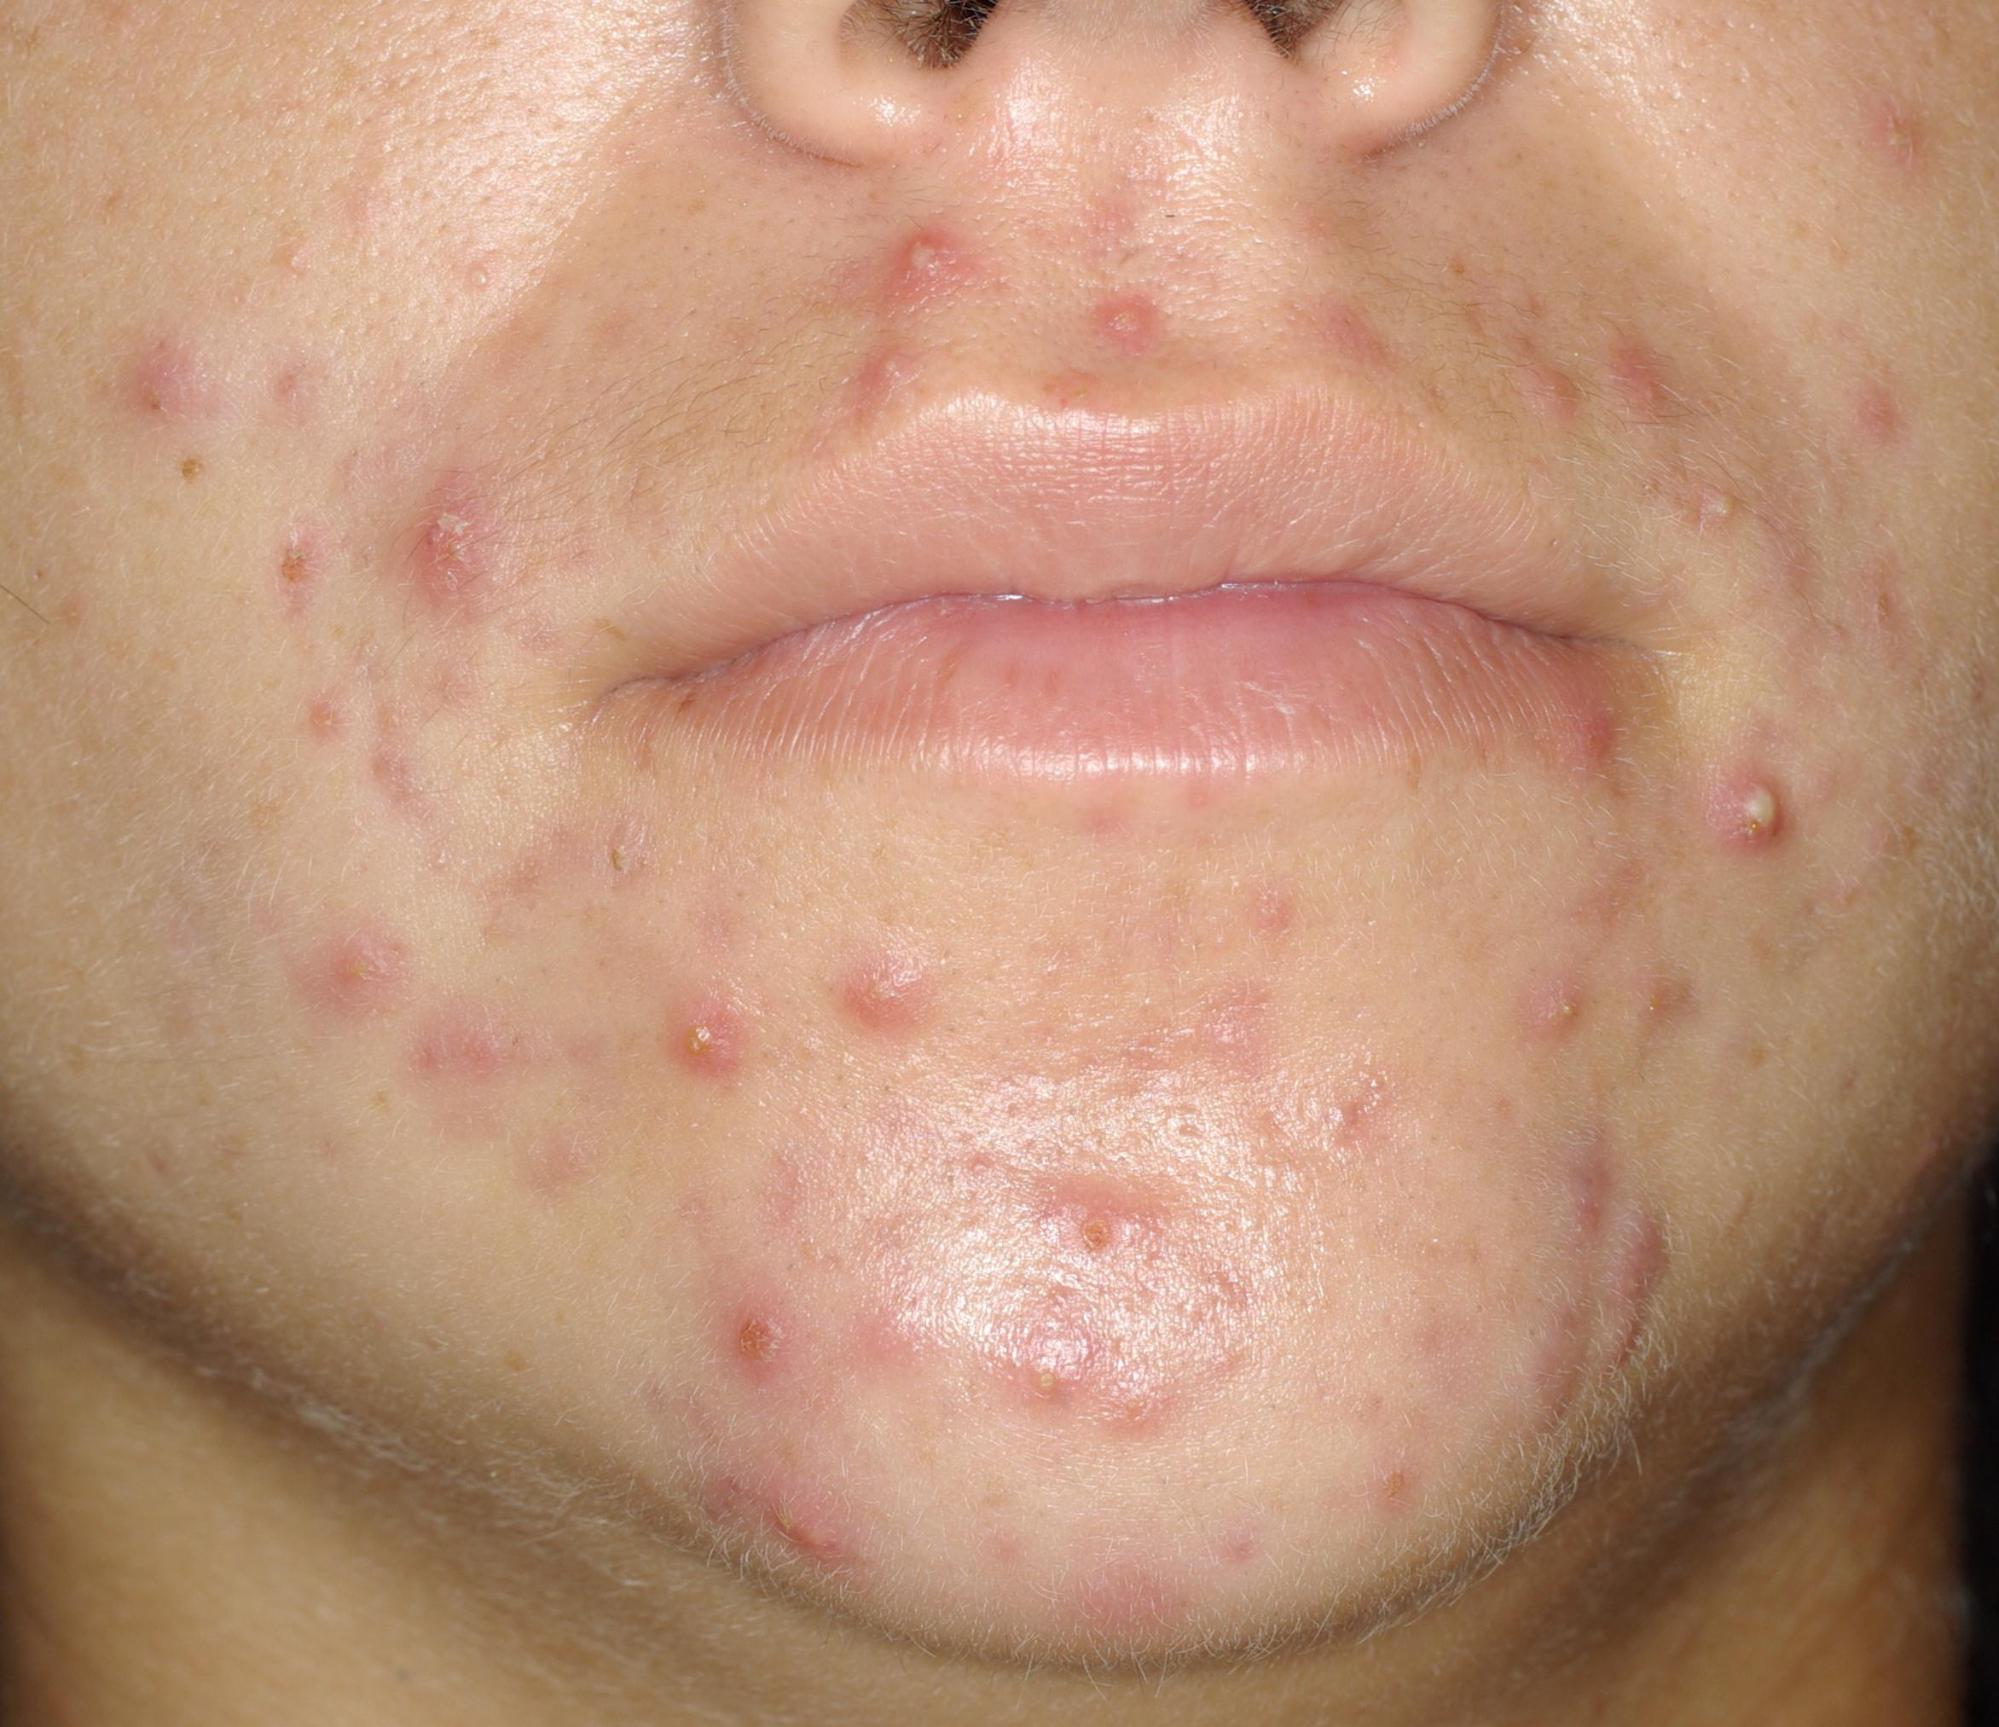 acné inflammatoire, papules pustules